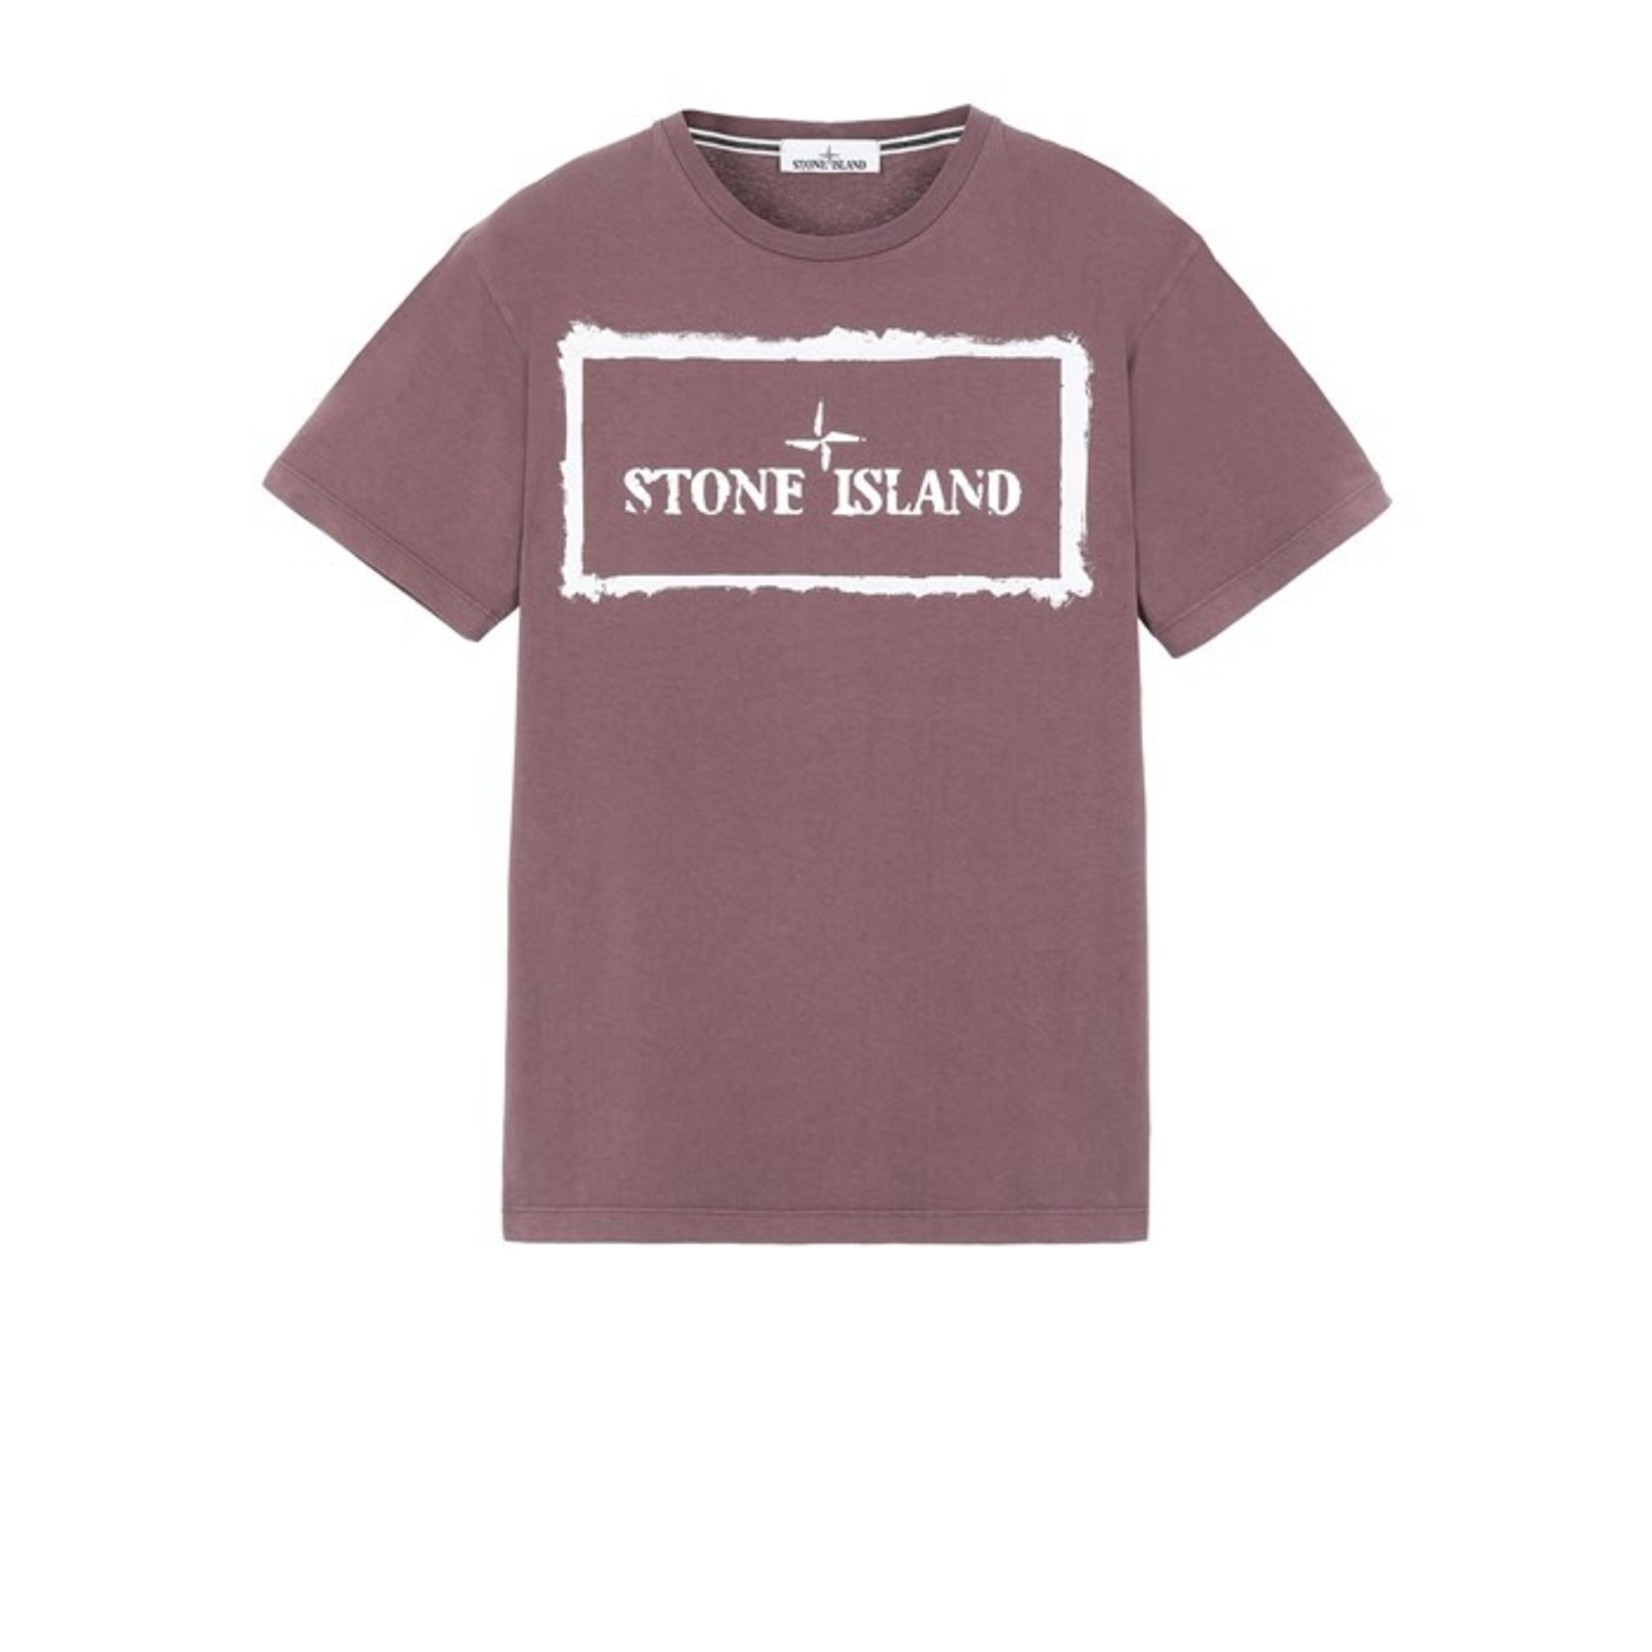 Stone Island Stencil Tee